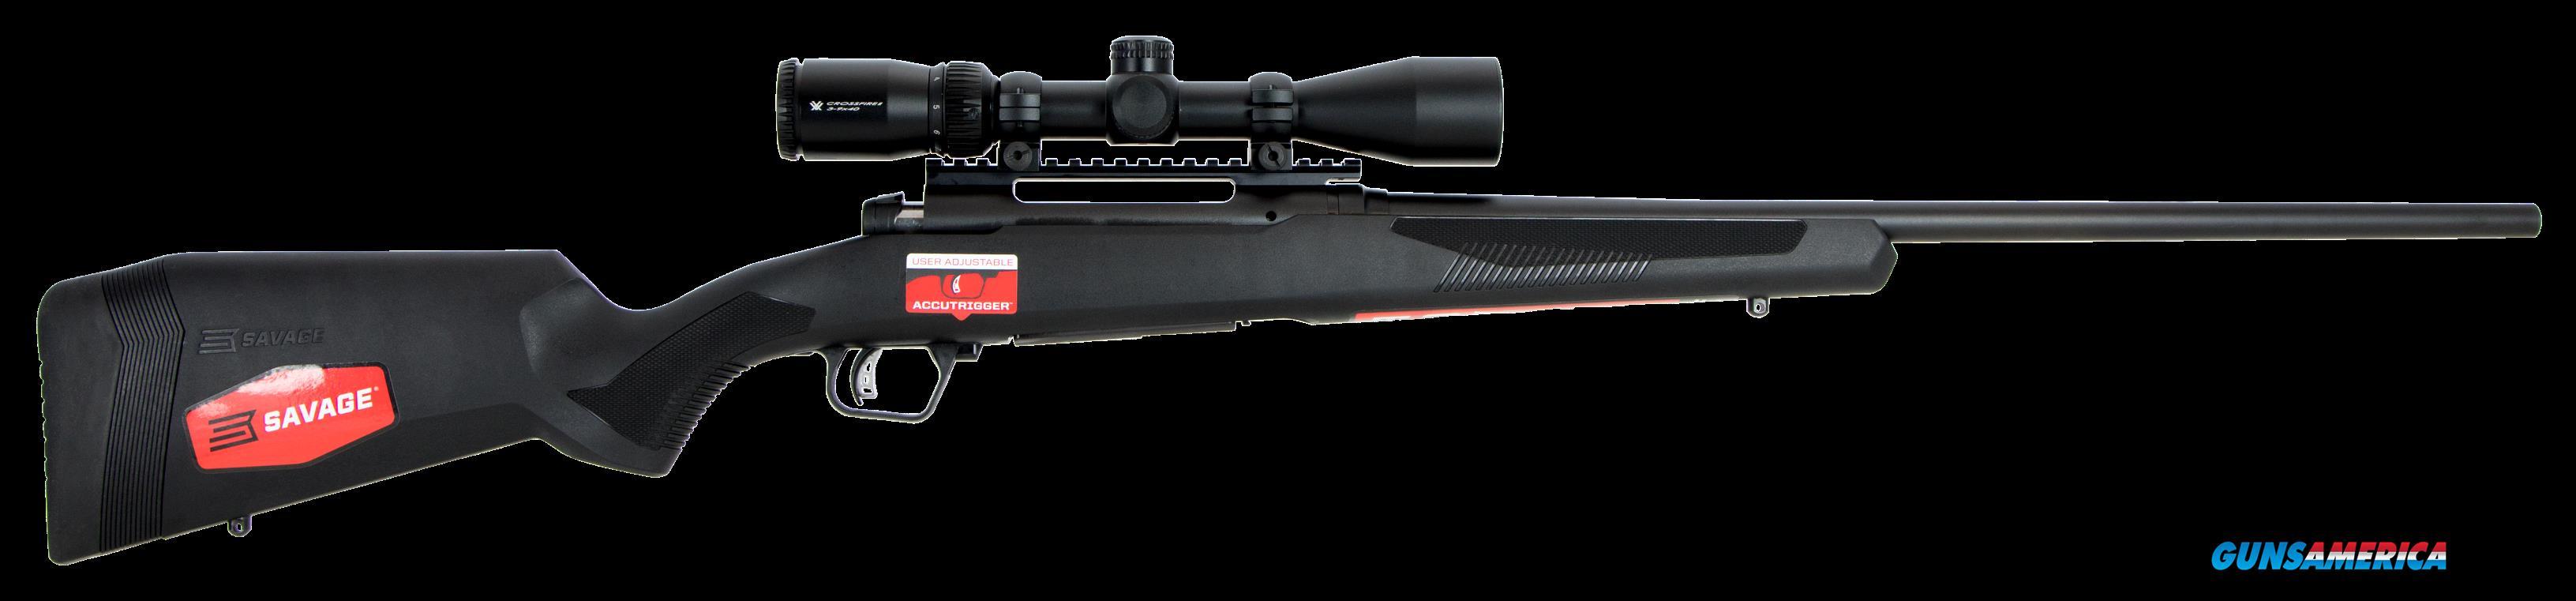 Savage 10-110, Sav 57326 110 Apex Hunter Xp 7mm Rem   Lh   Vortex  Guns > Pistols > 1911 Pistol Copies (non-Colt)